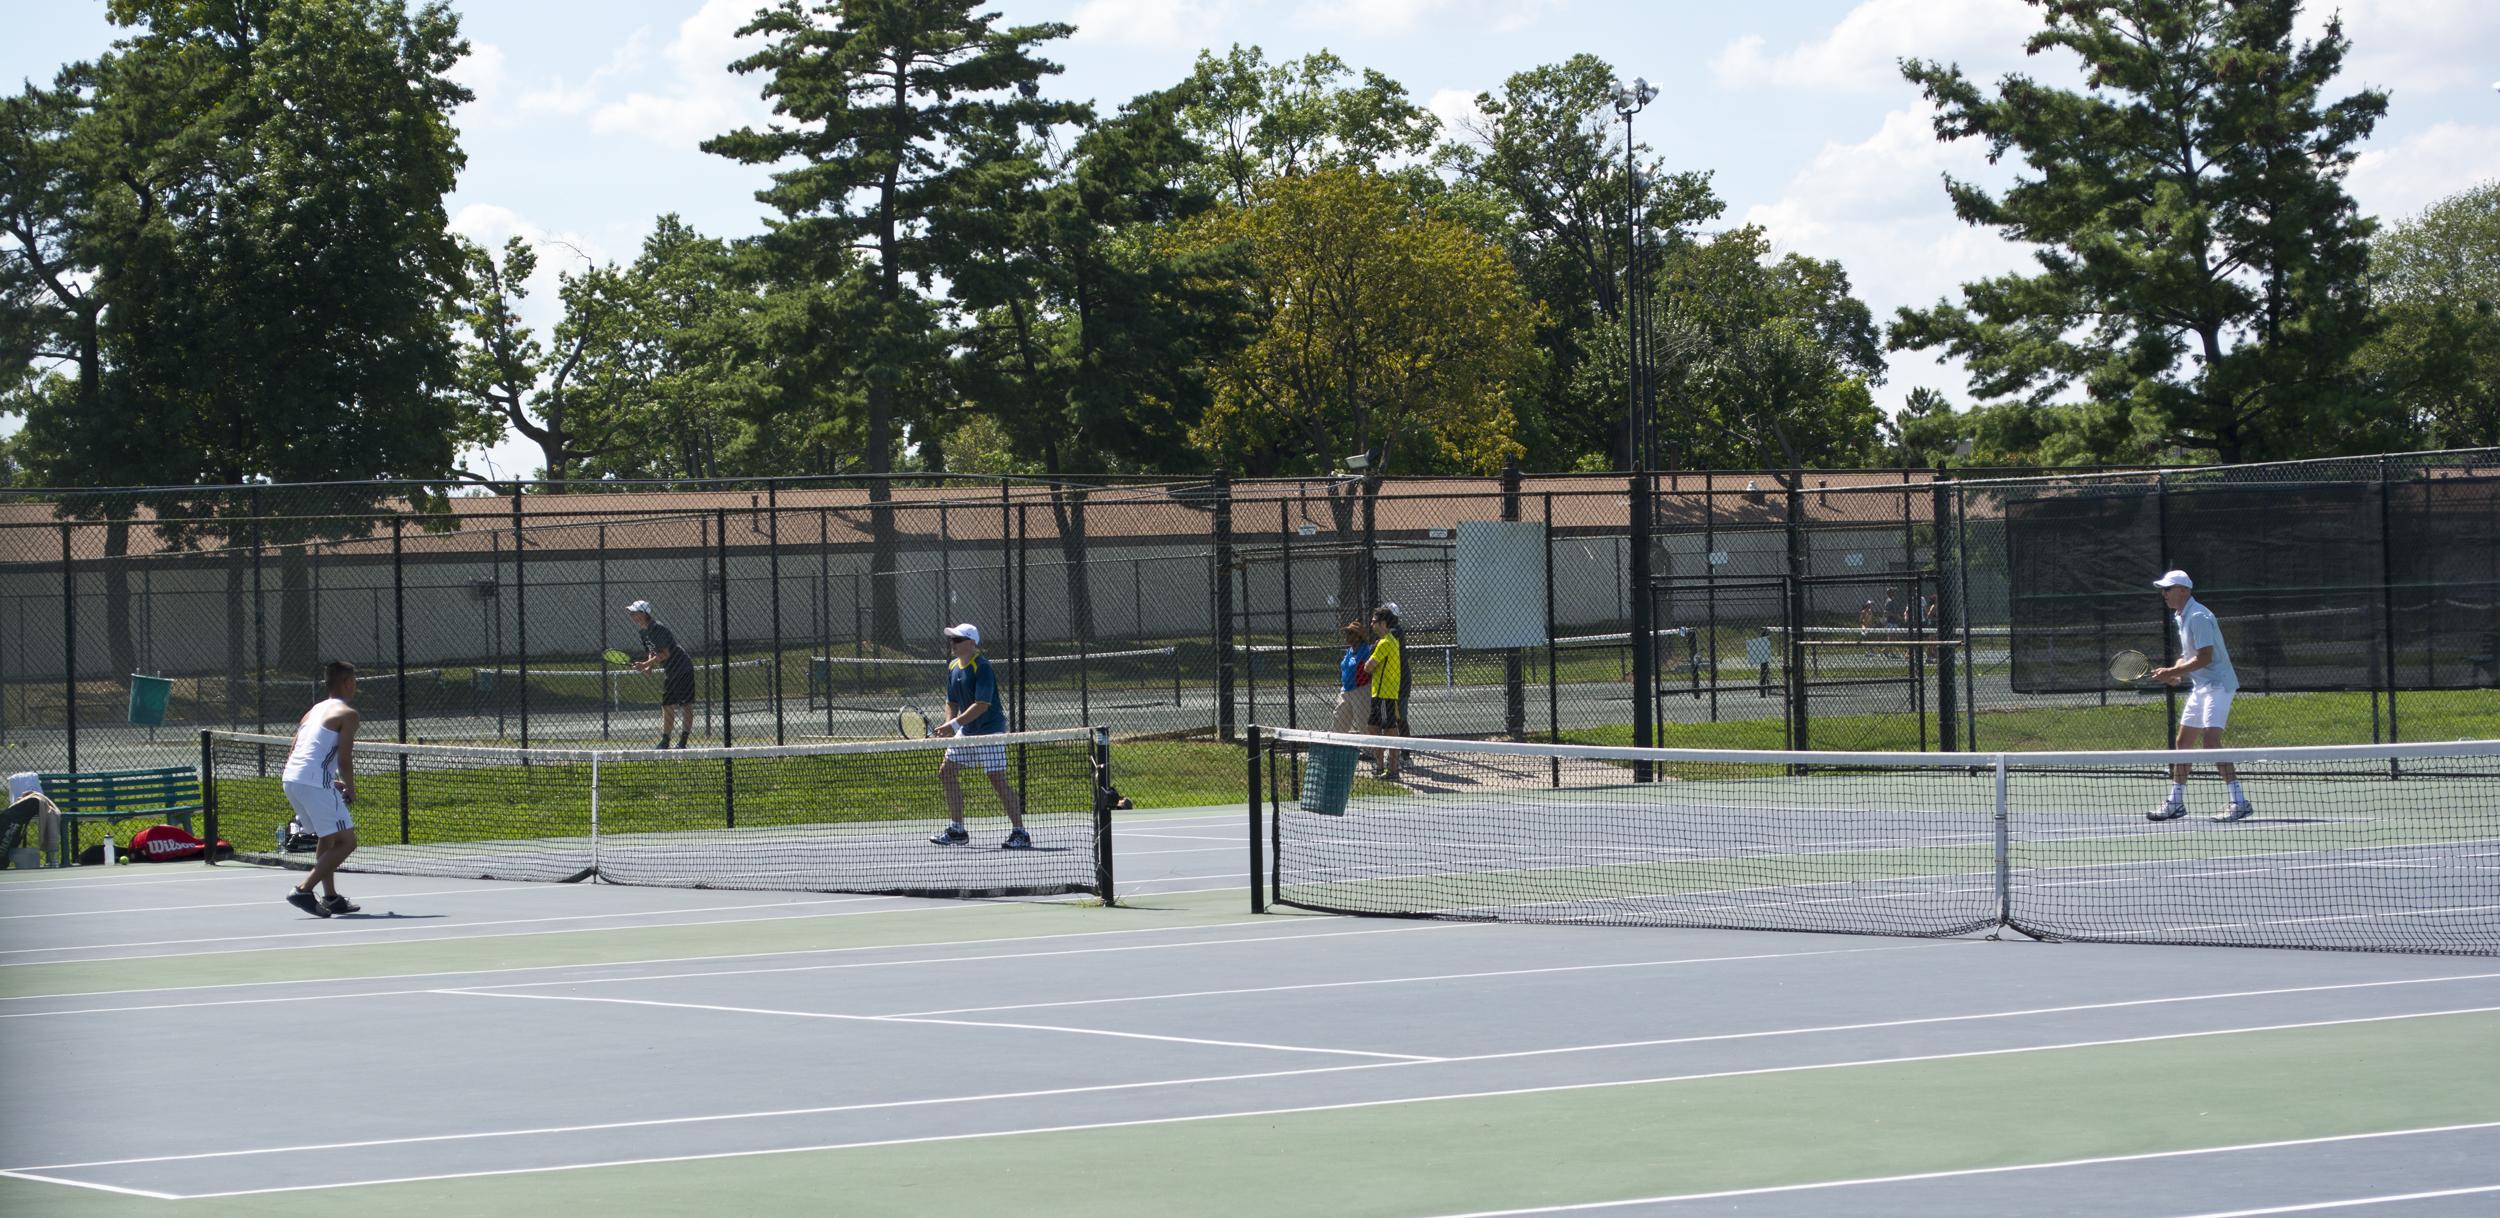 Tennis Club Of Rochester